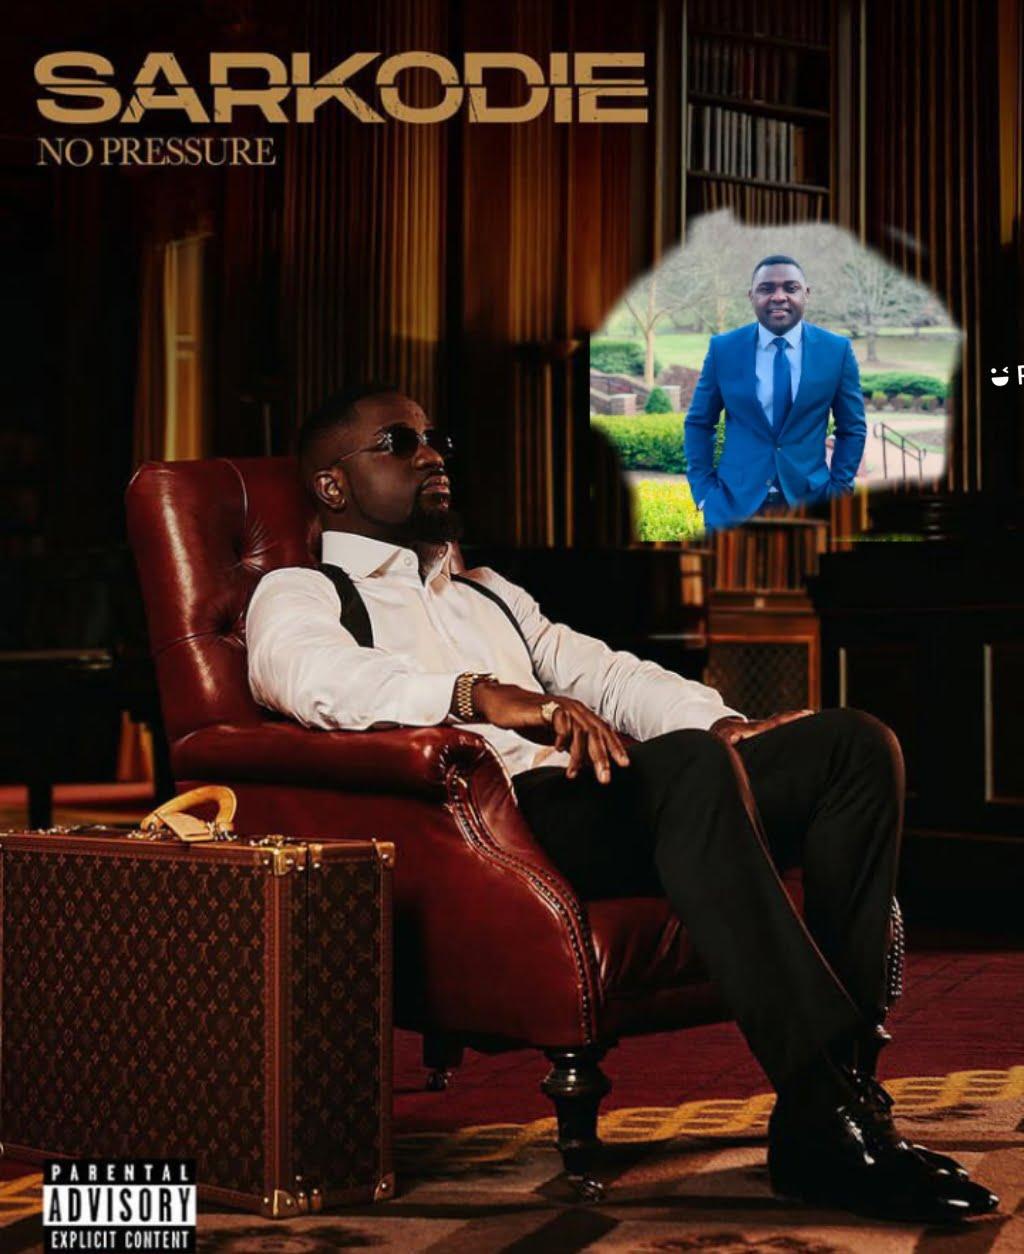 Sarkodie Disses Kelvin Taylor On His No Pressure Album